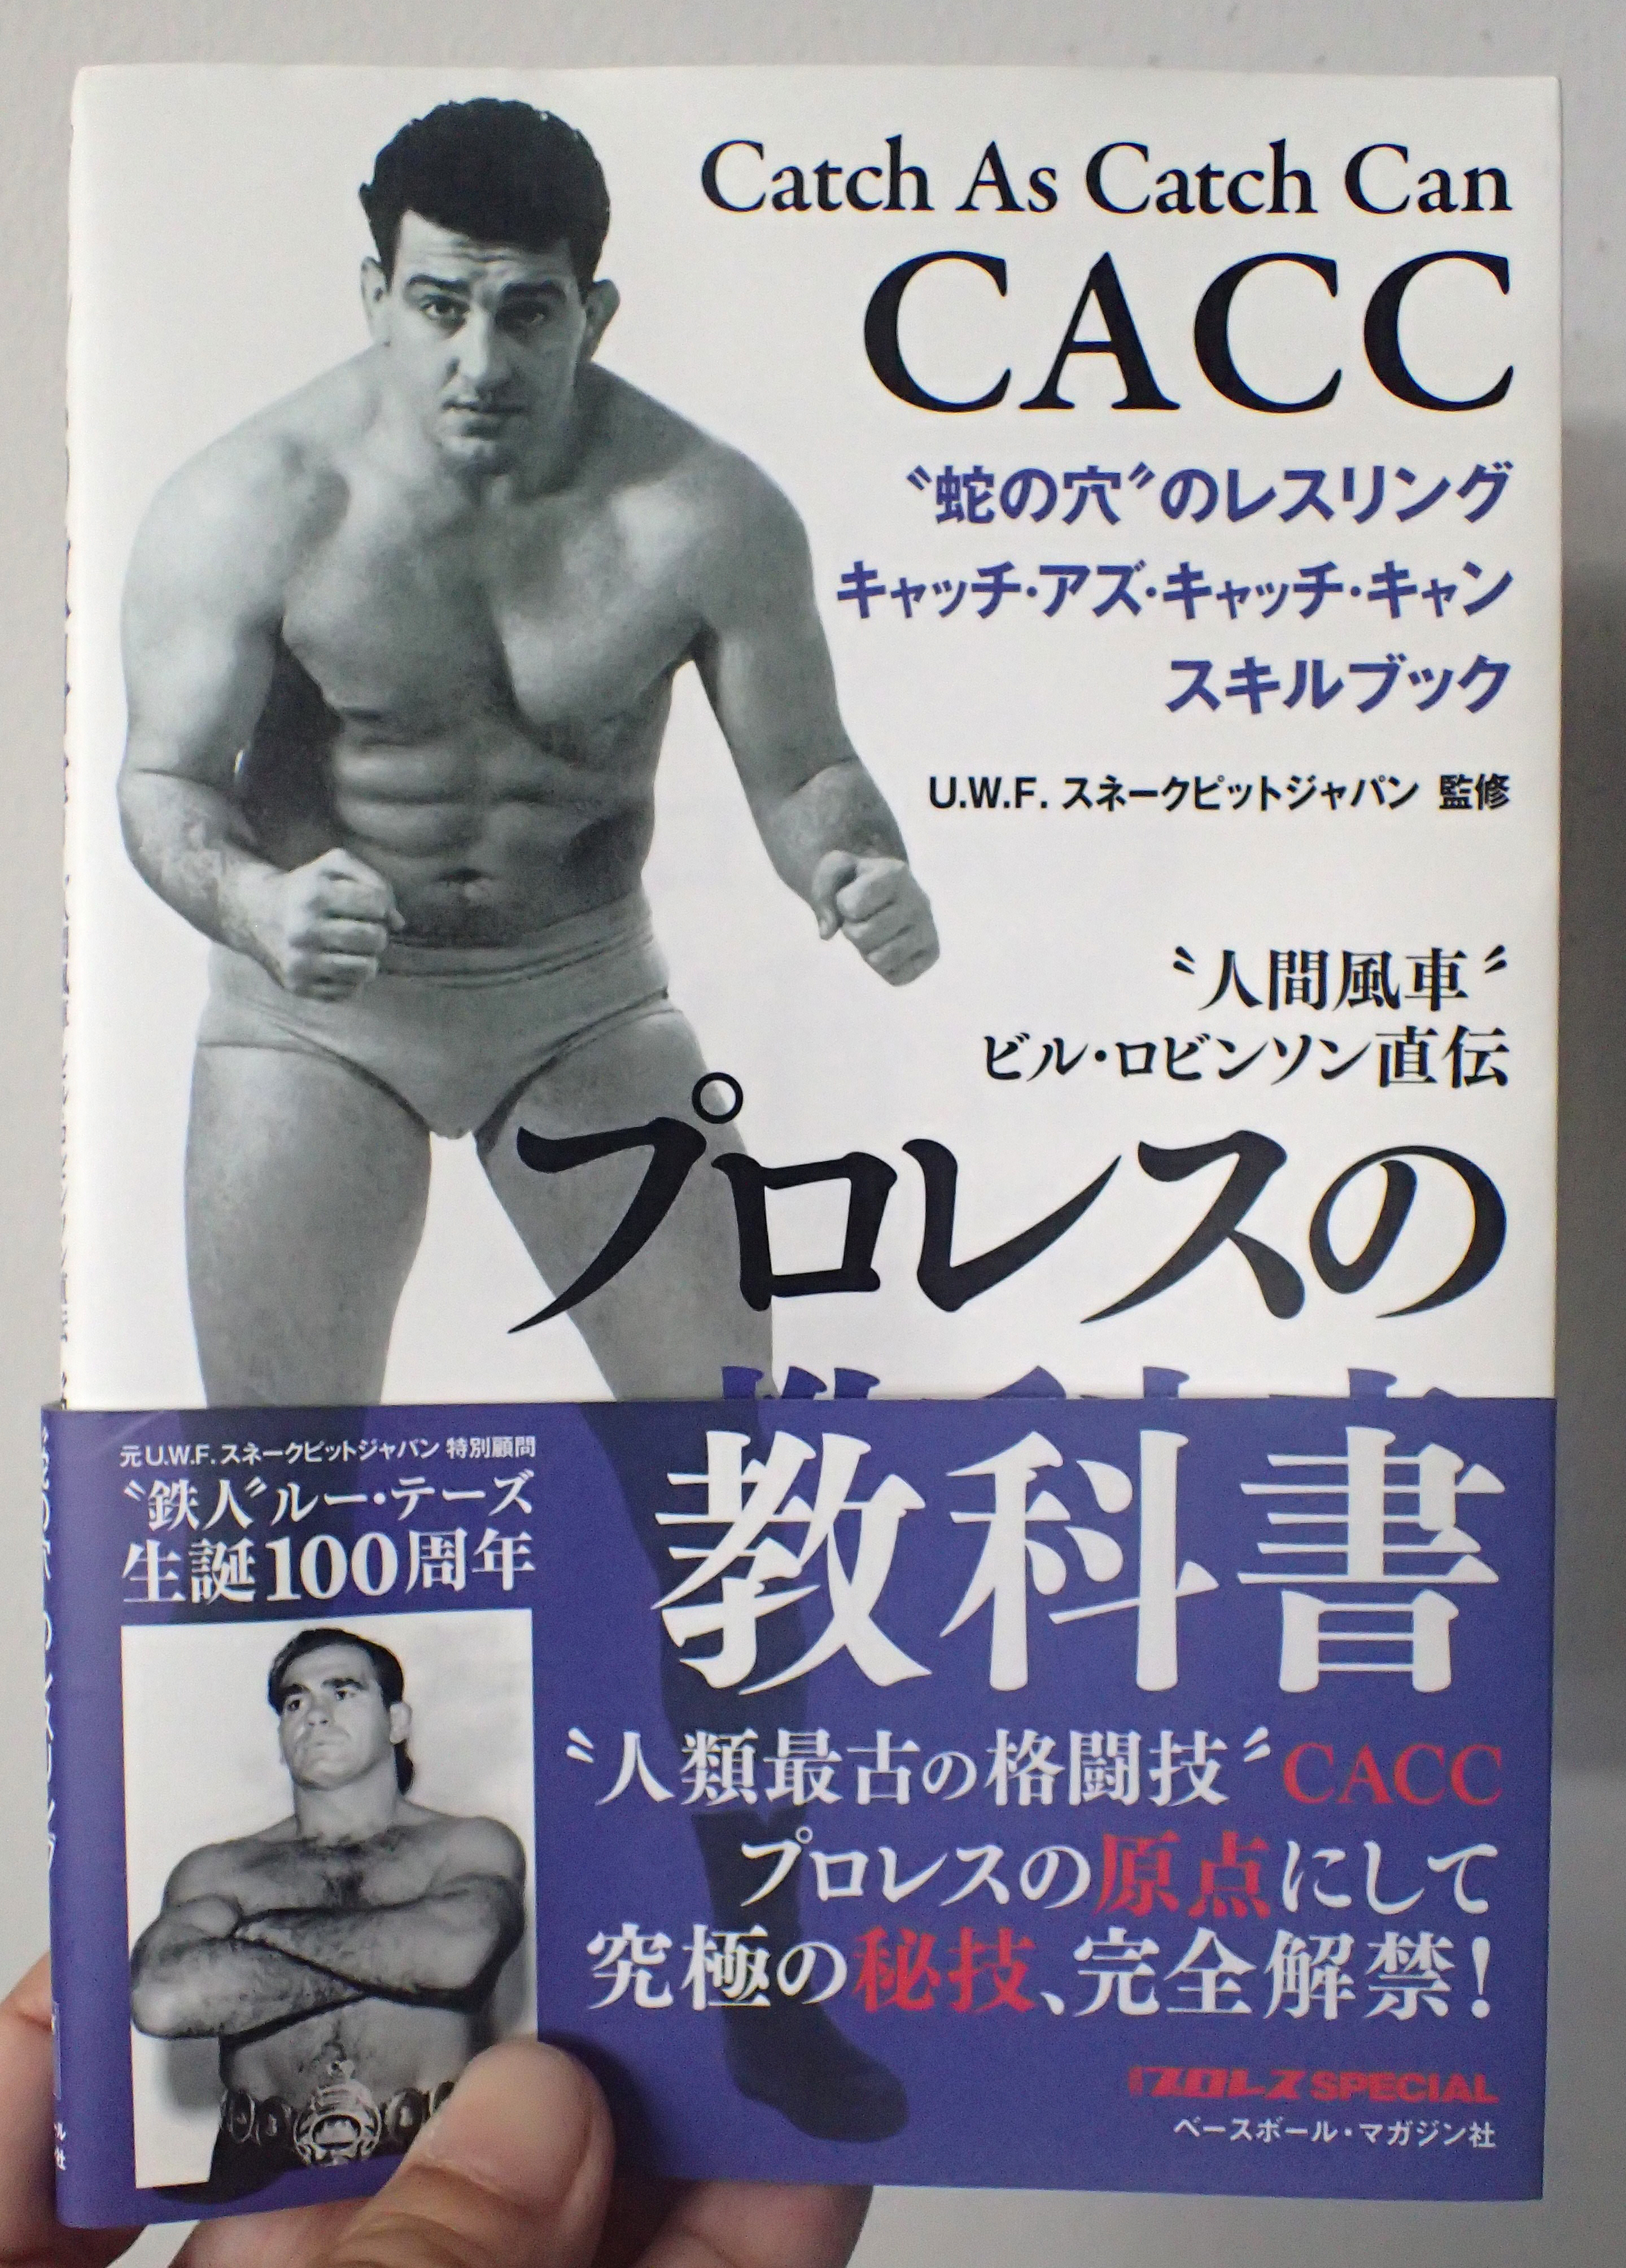 CACC.jpg